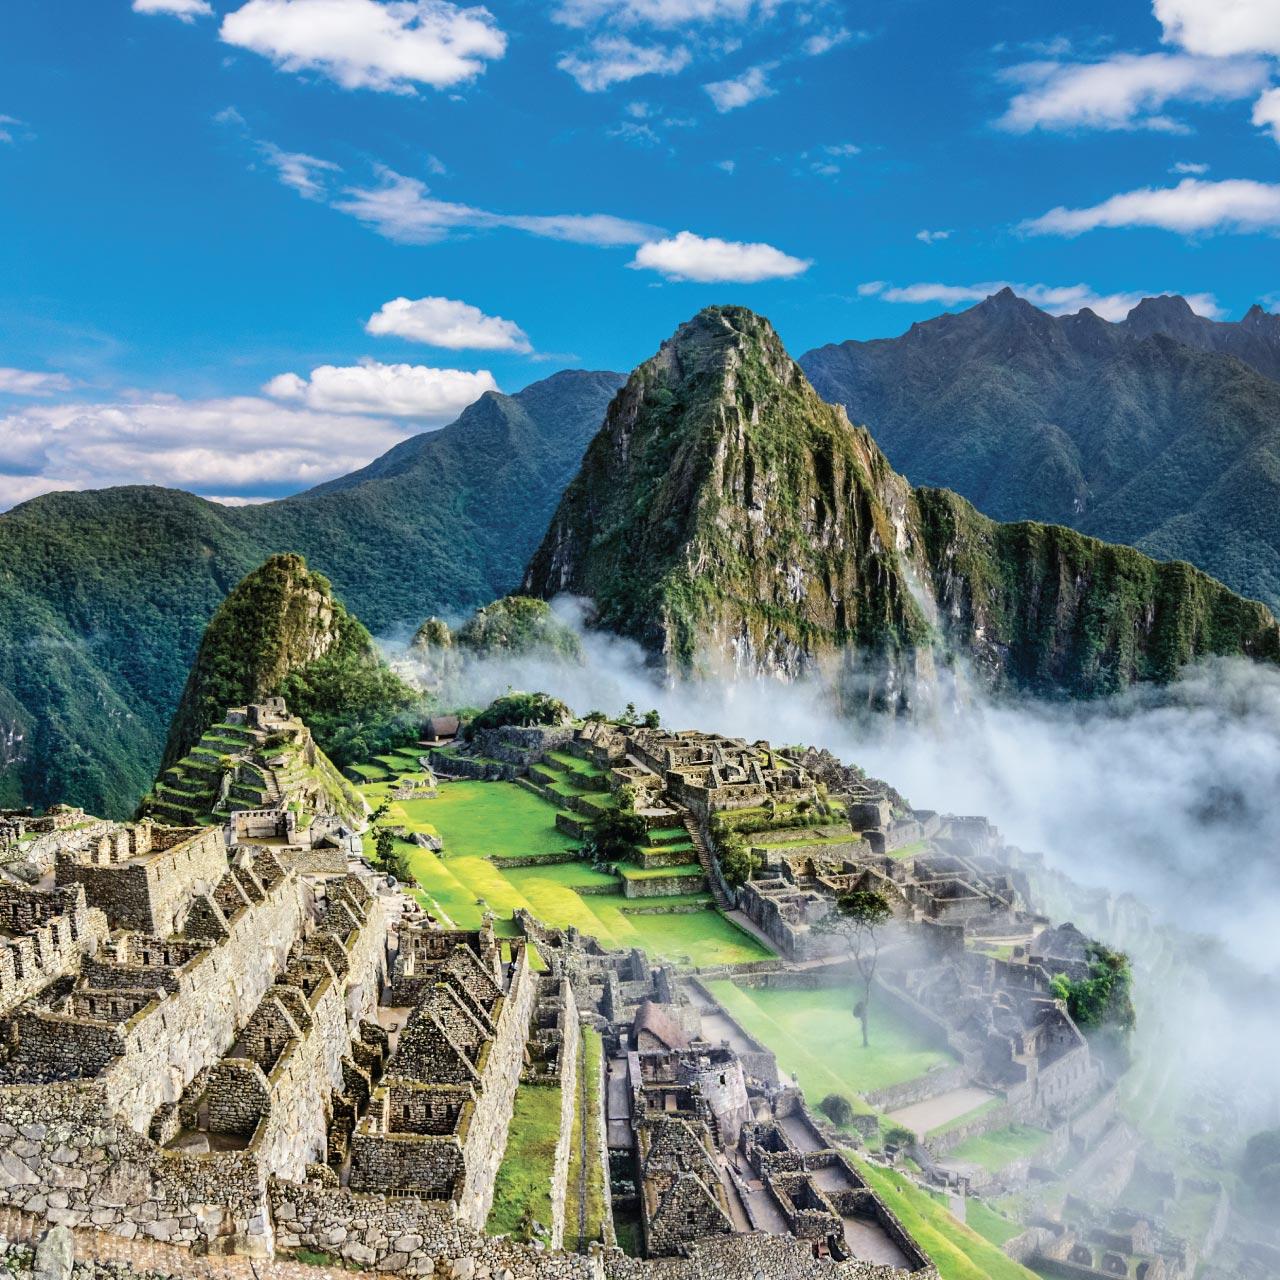 https://usercontent.one/wp/www.southtravelers.com/wp-content/uploads/2019/10/Peru.jpg